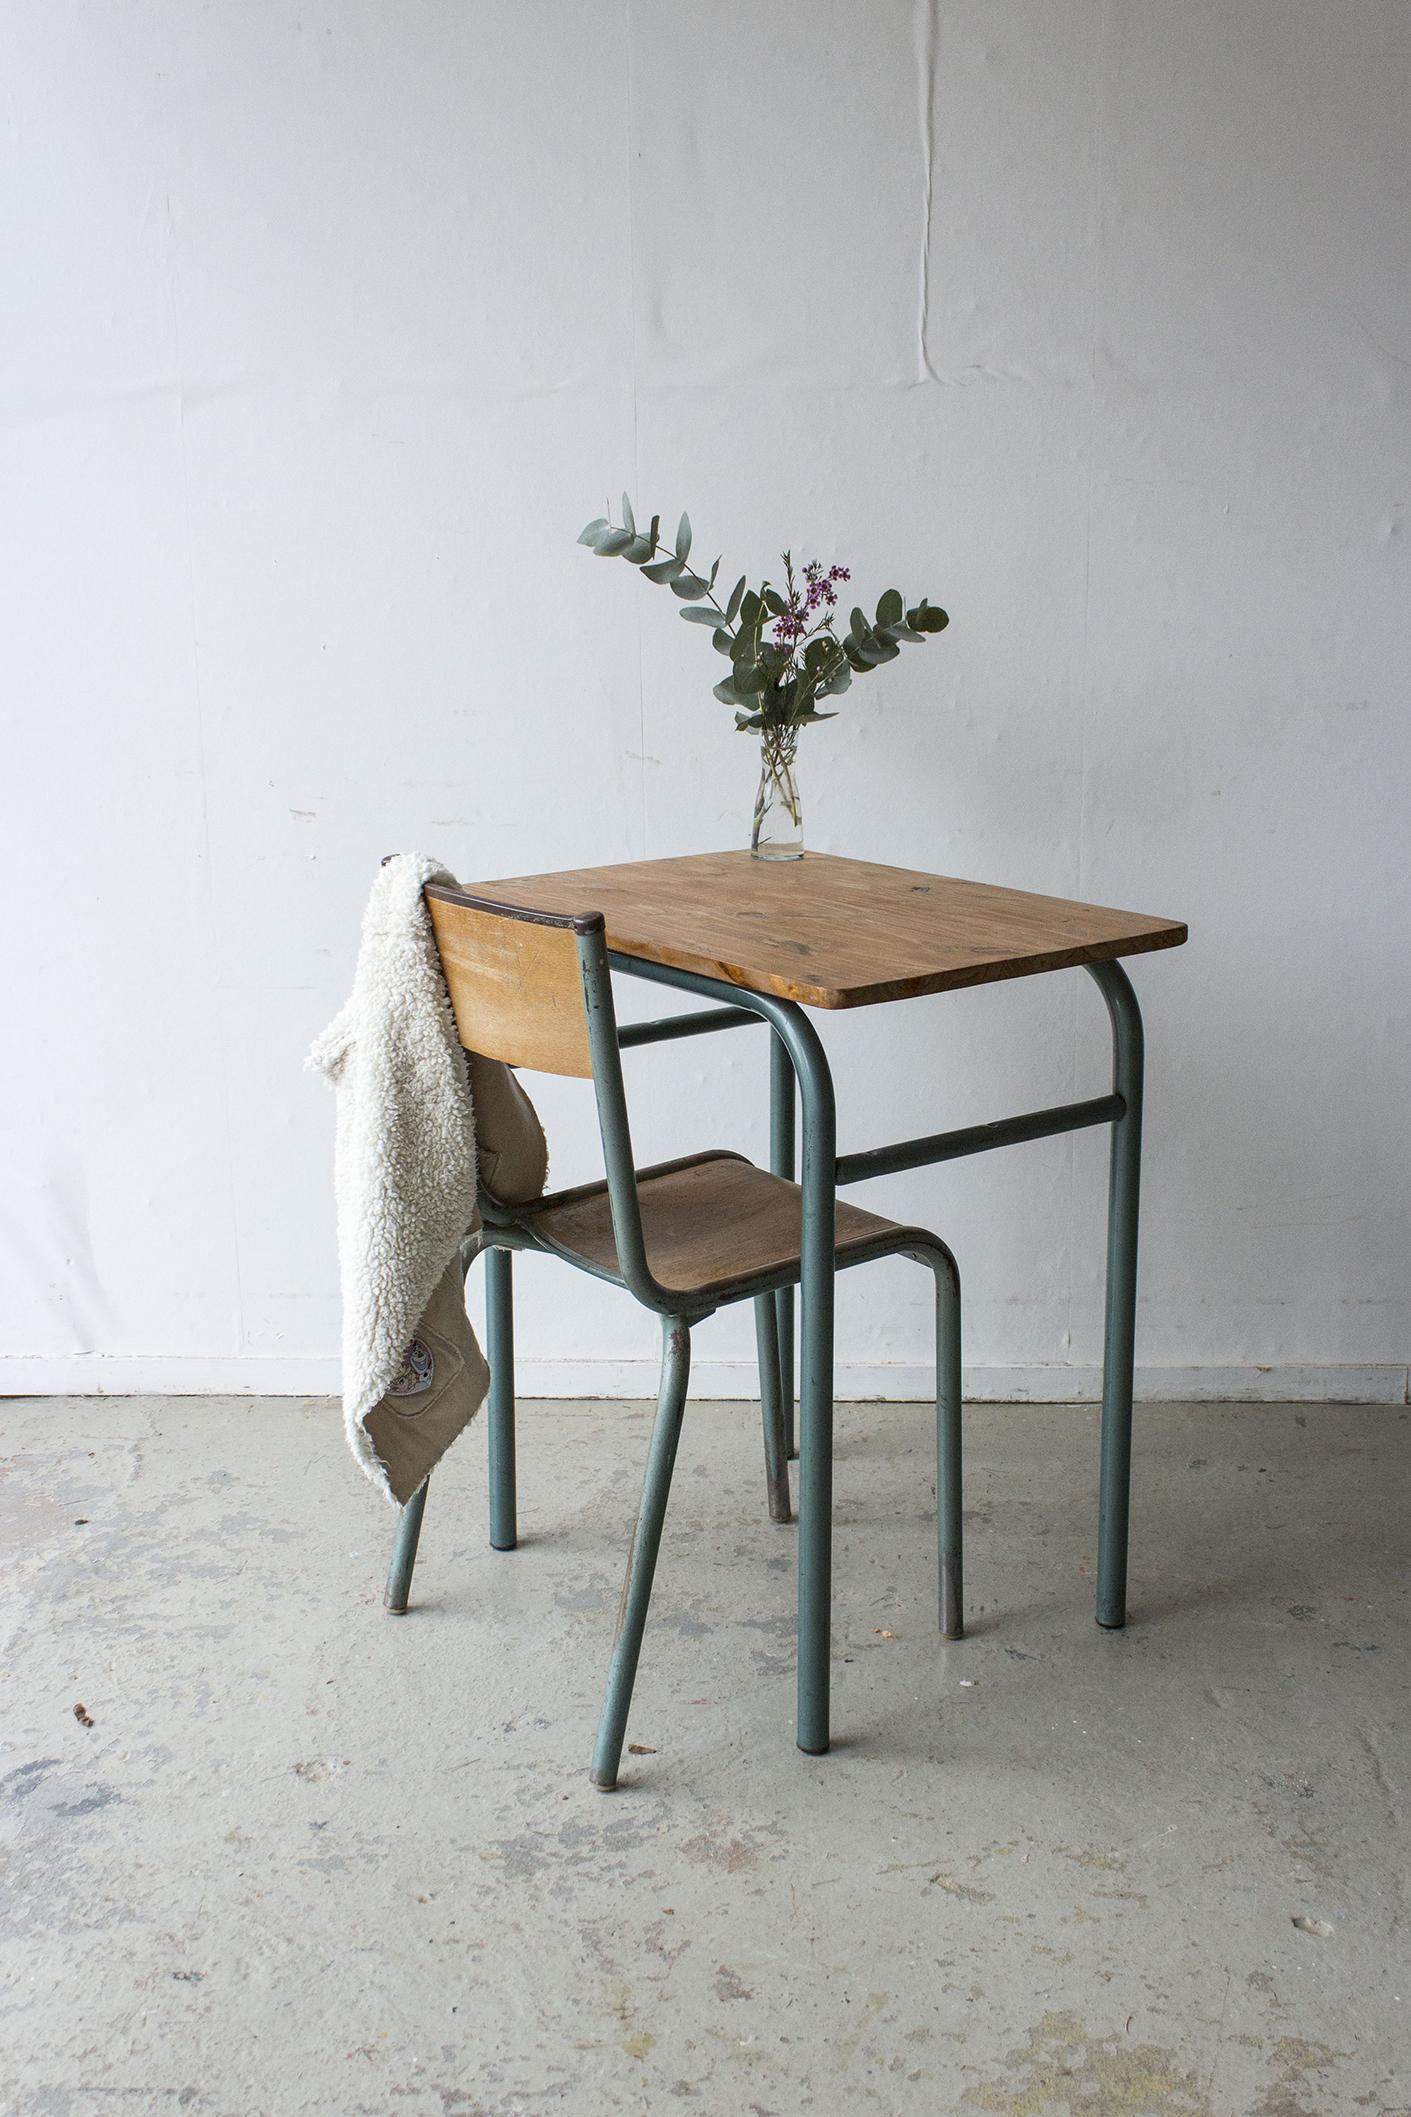 3176 - 1p vintage schooltafel met groen frame - Firma zoethout_3.jpg